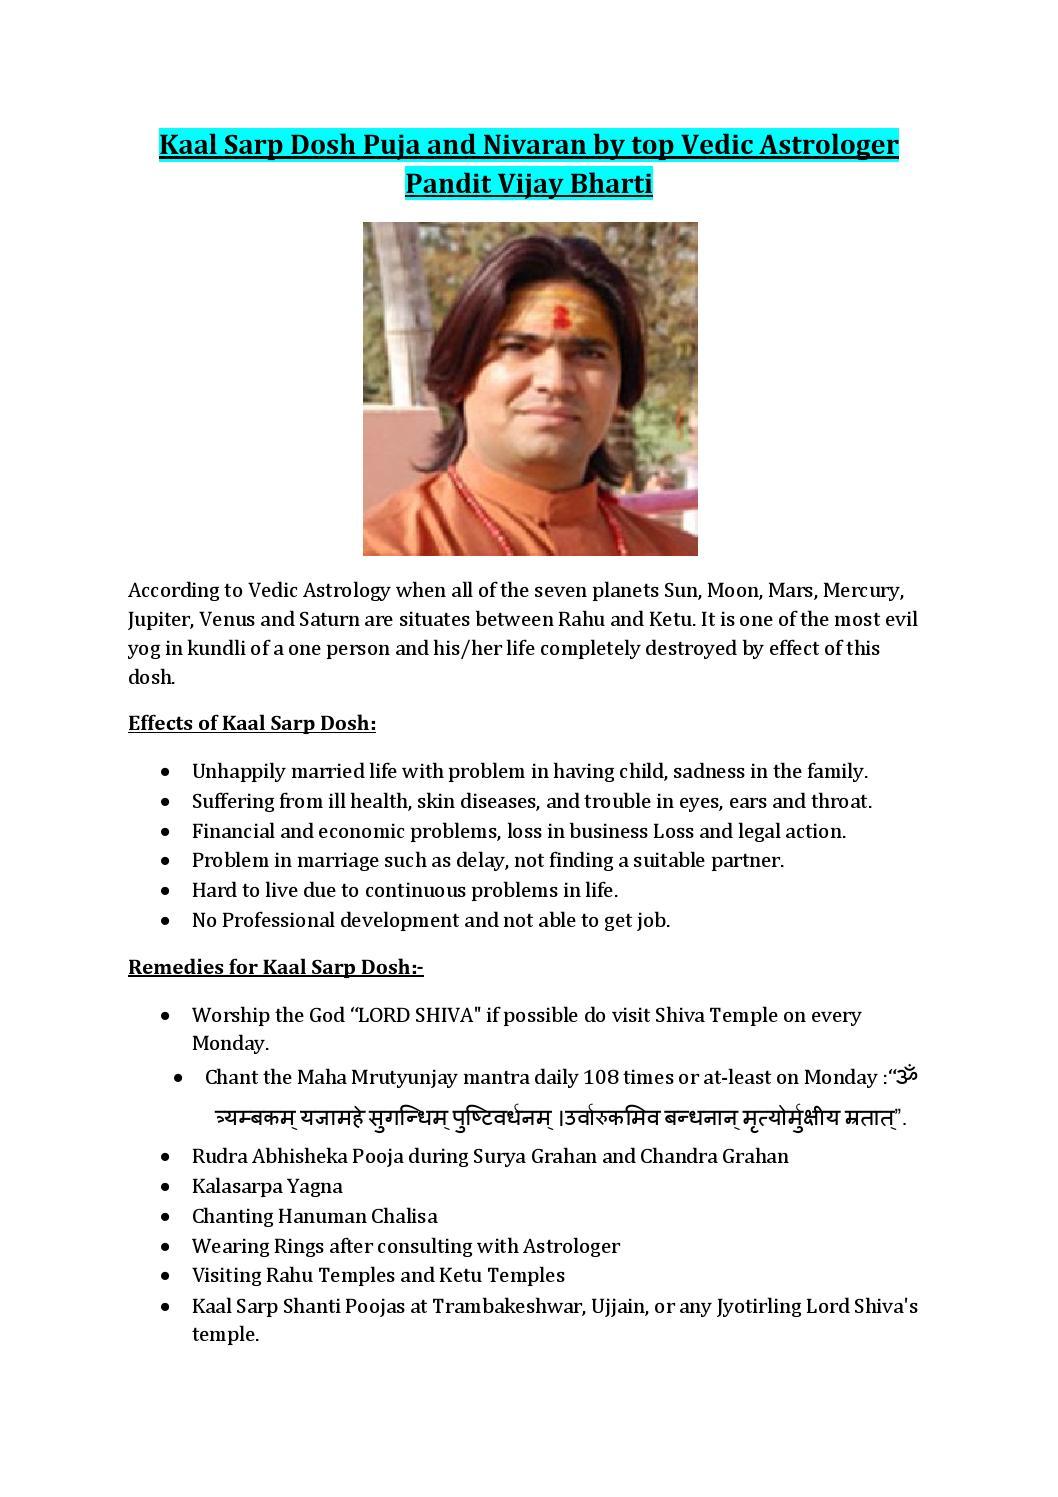 Kaal Sarp Dosh Puja and Nivaran by top Vedic Astrologer